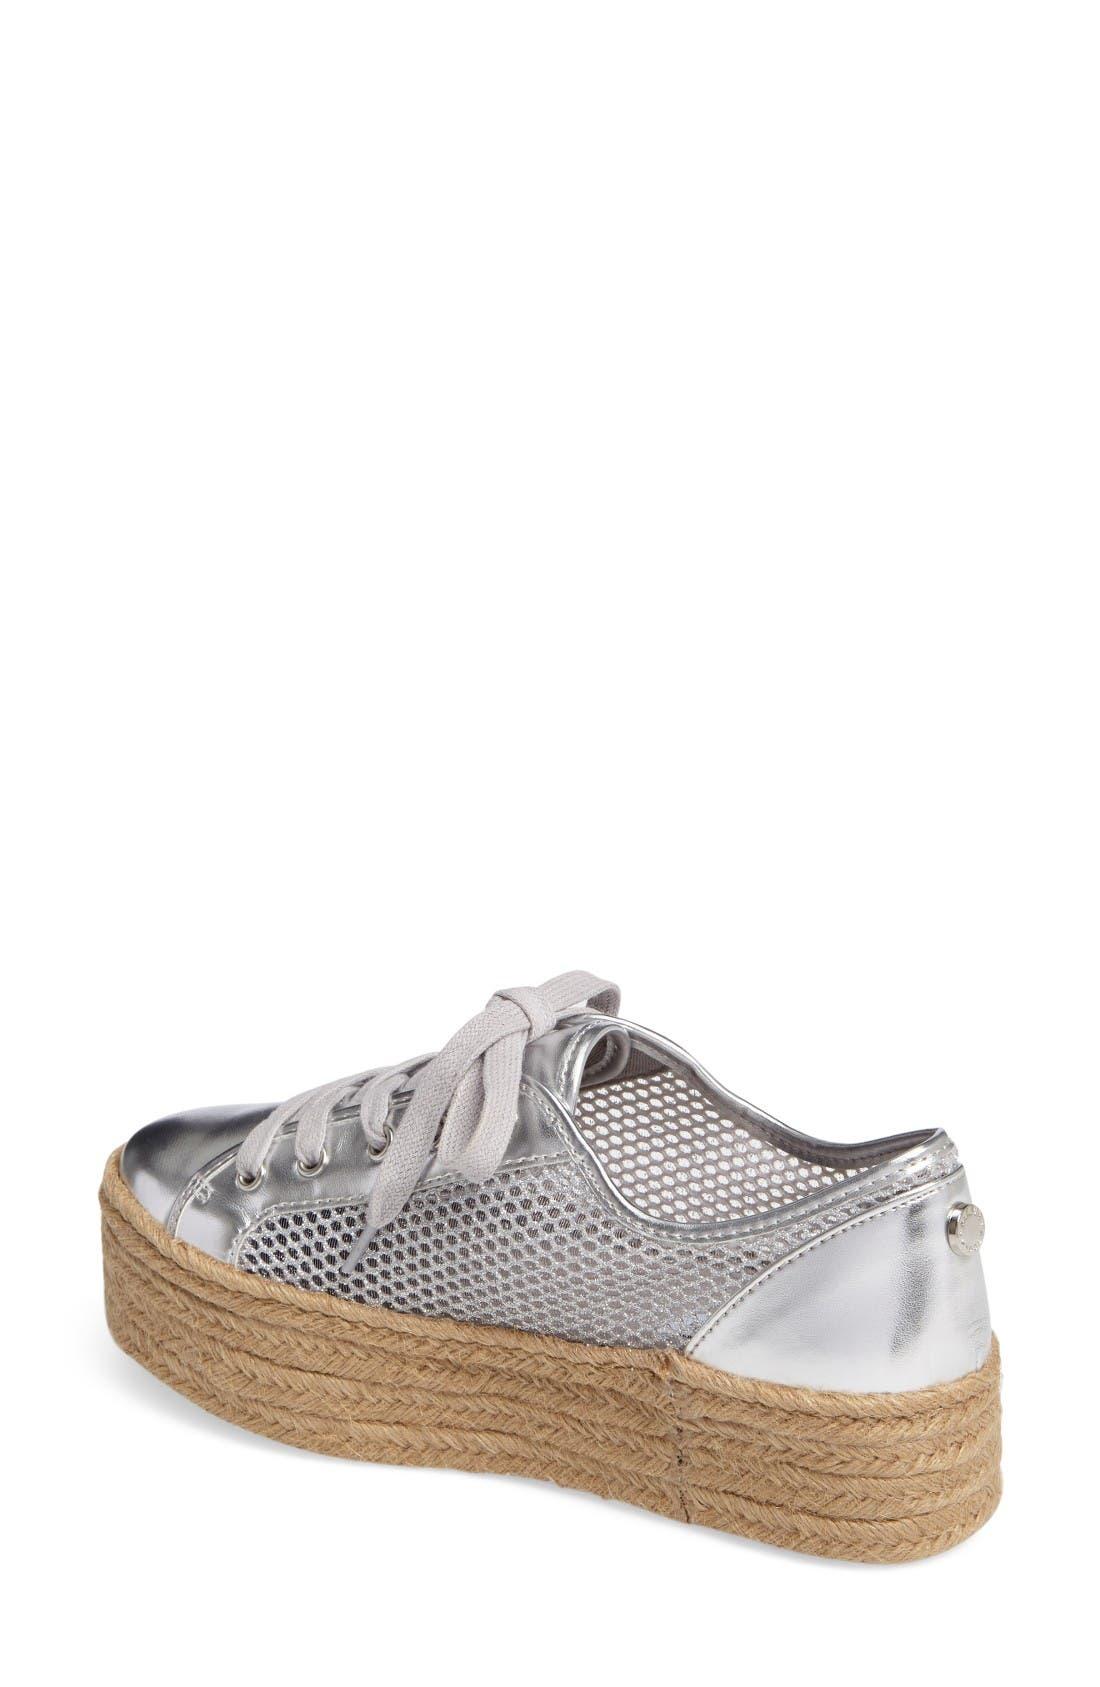 Mars Platform Sneaker,                             Alternate thumbnail 2, color,                             Silver